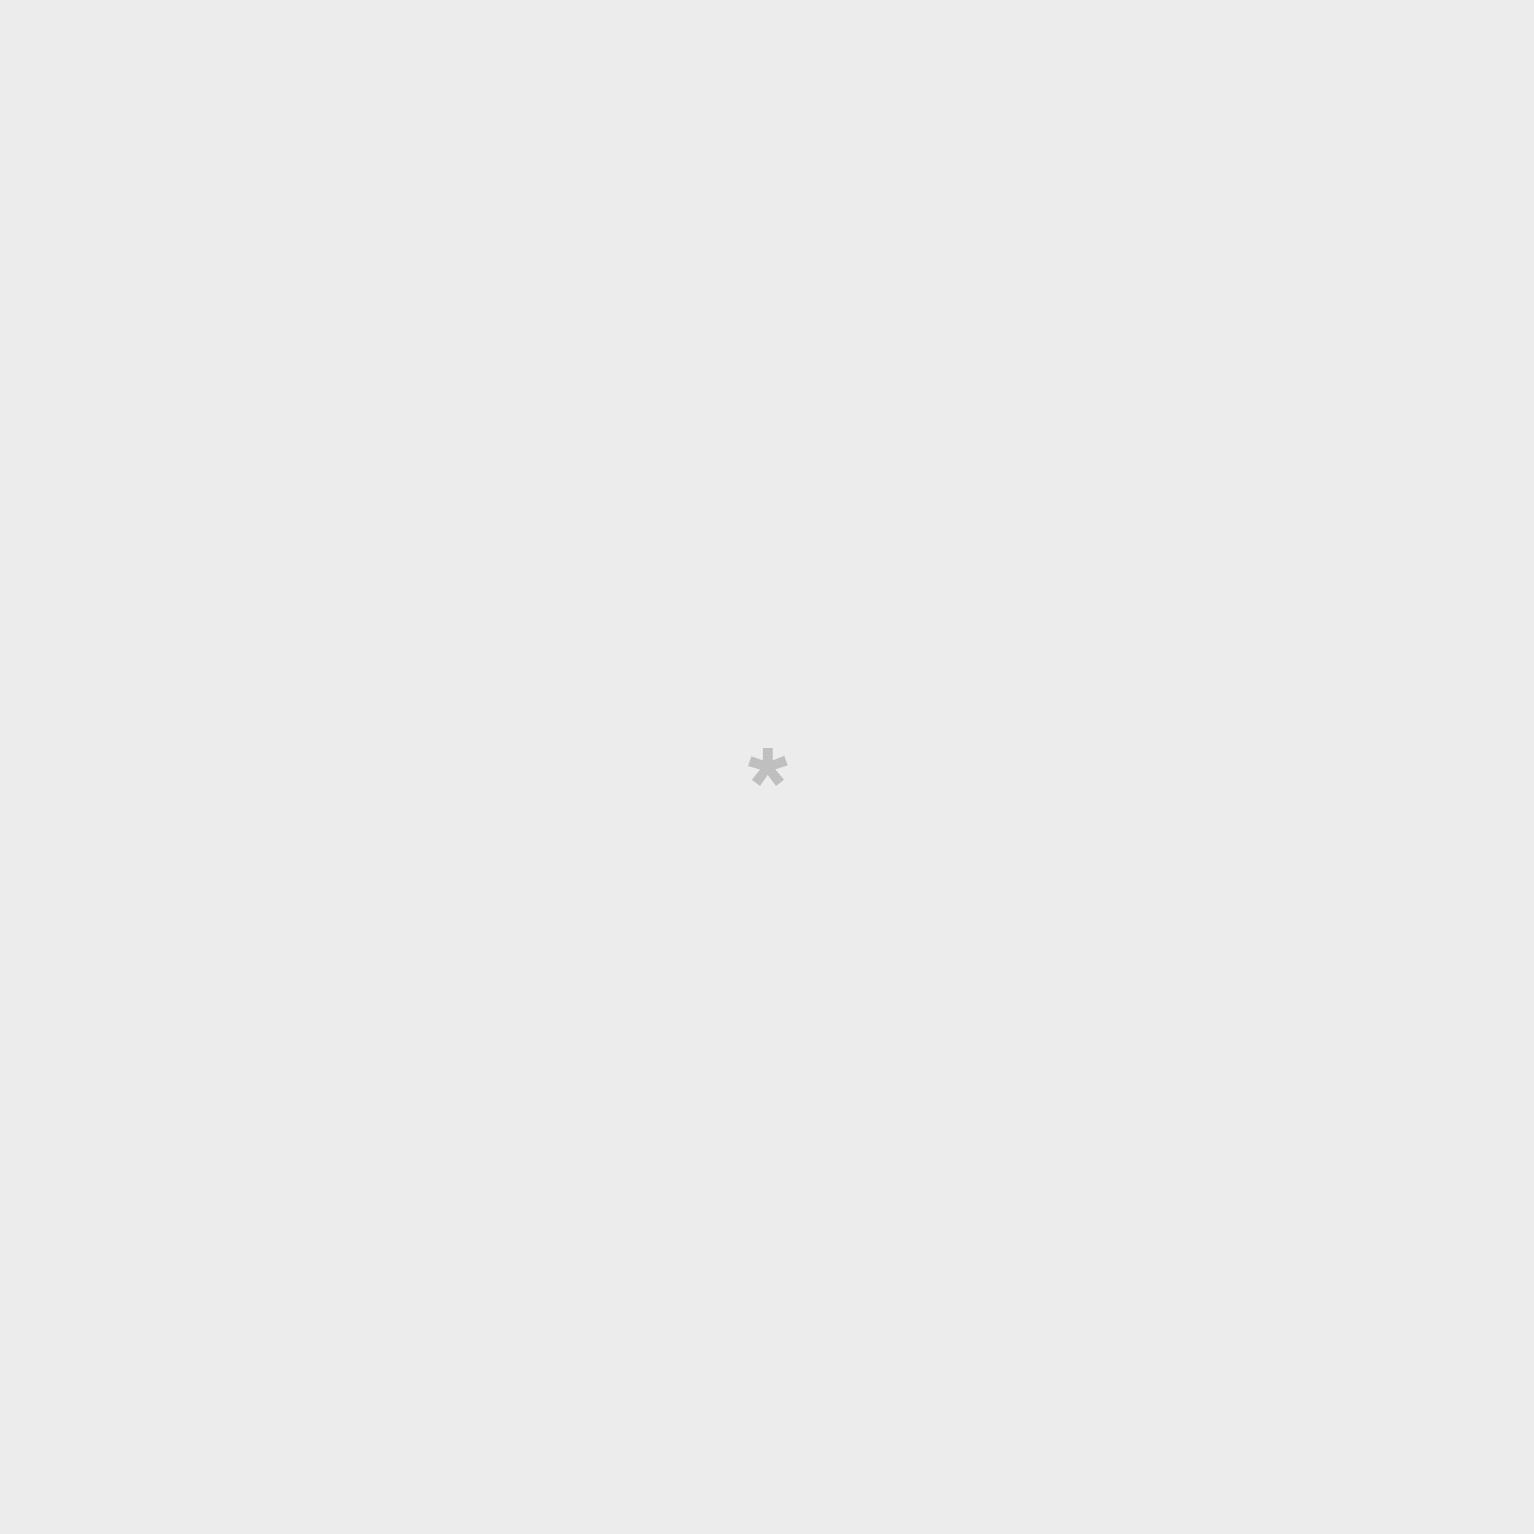 Bedding set (size 150) - Good morning everyone